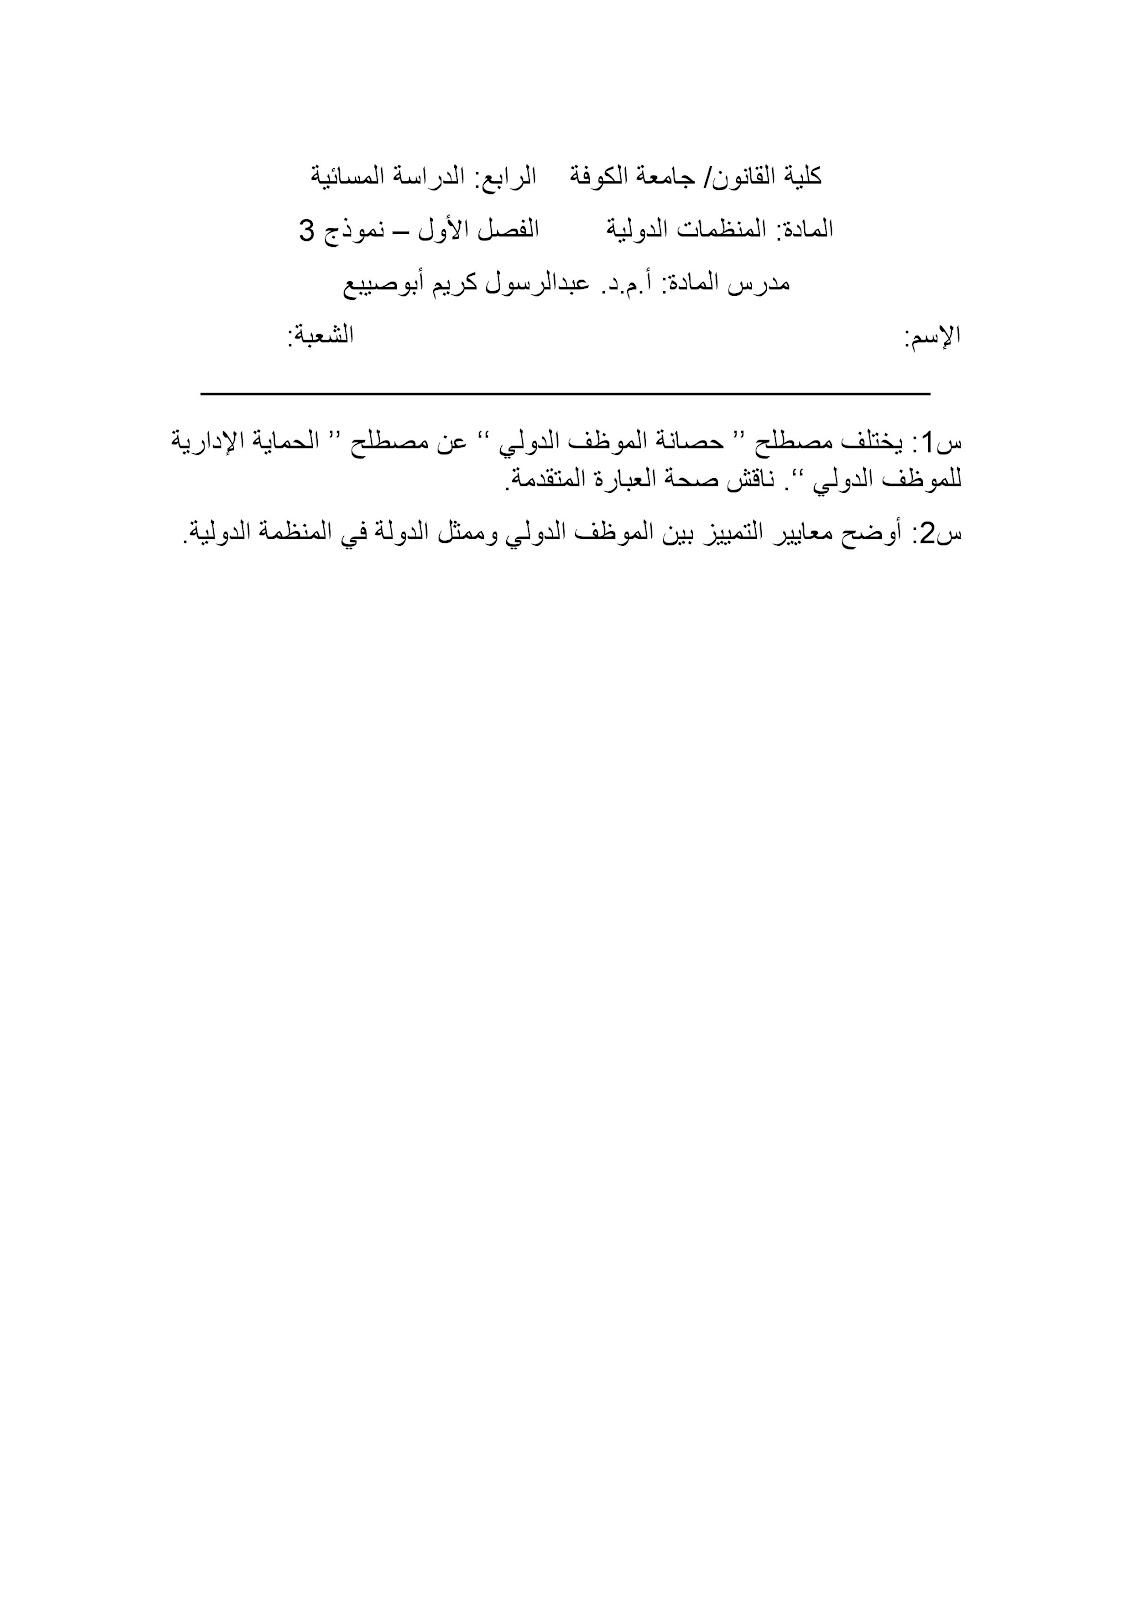 8.page1.jpg